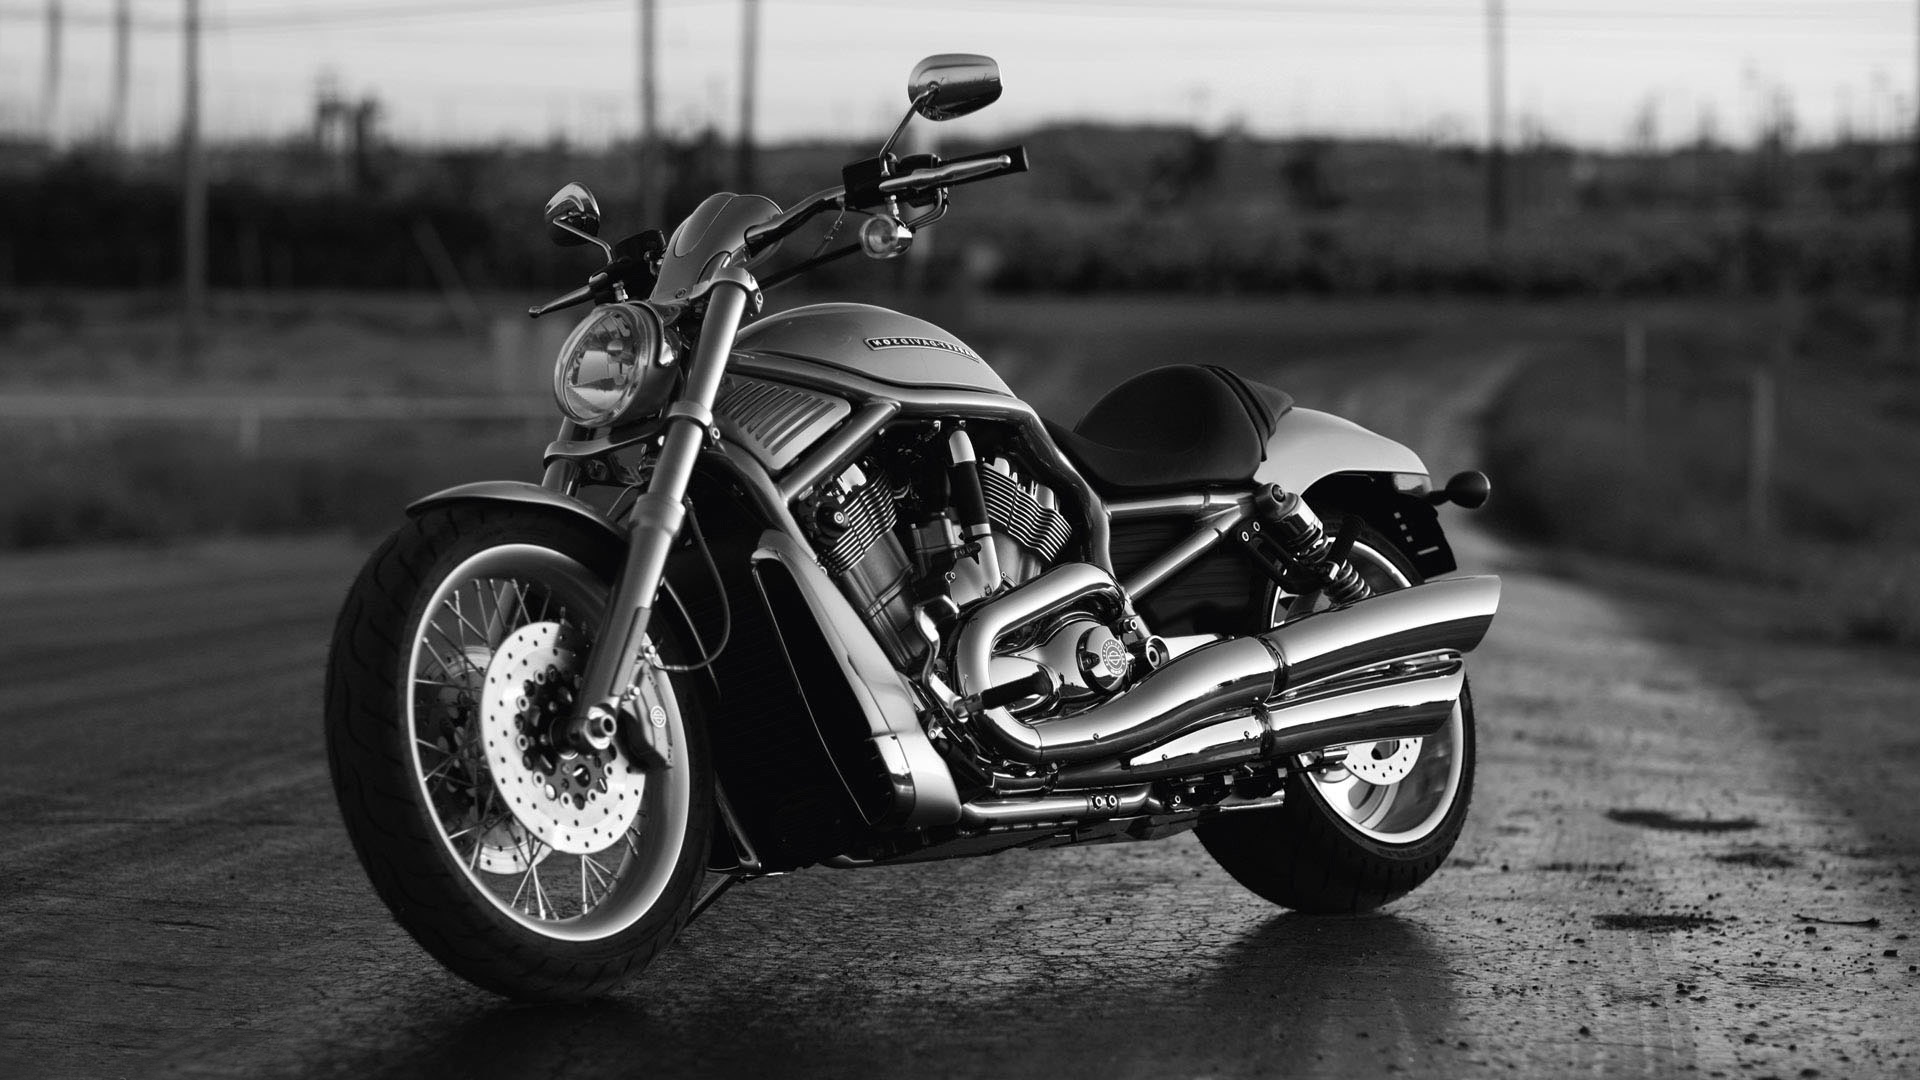 73 Harley Davidson Wallpaper Widescreen On Wallpapersafari